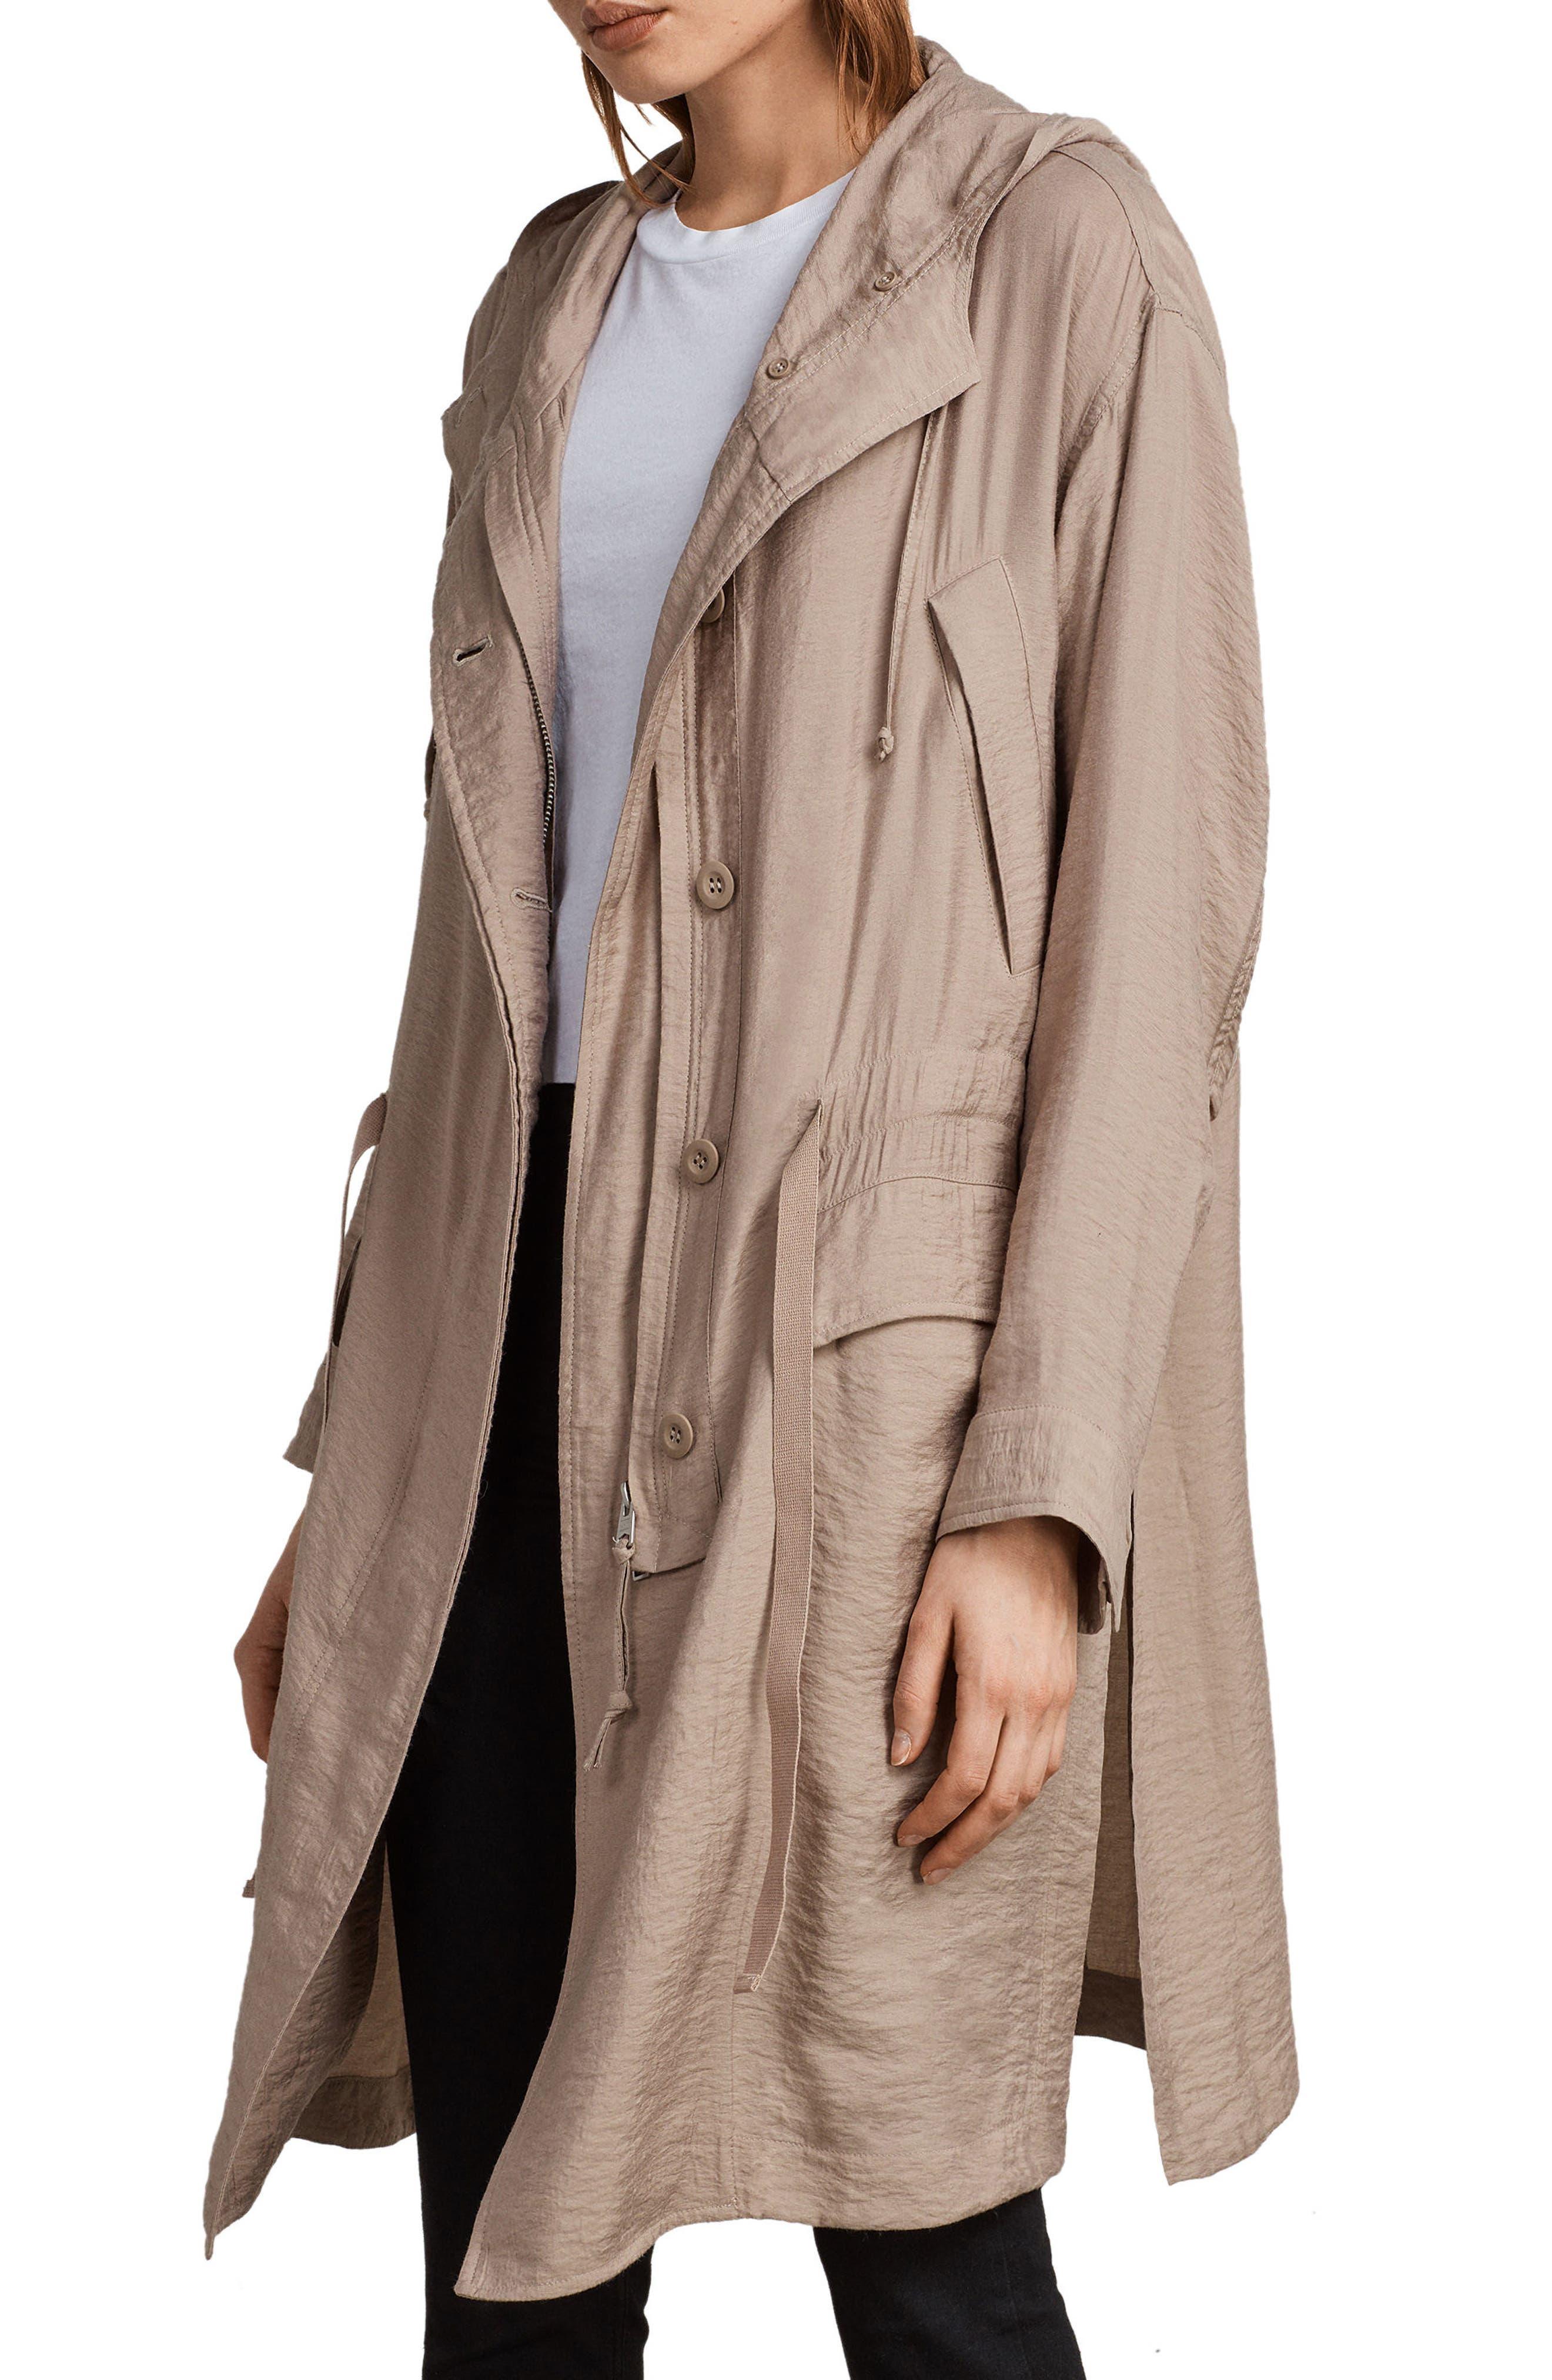 Kinsley Hooded Jacket,                             Alternate thumbnail 5, color,                             Dusty Pink